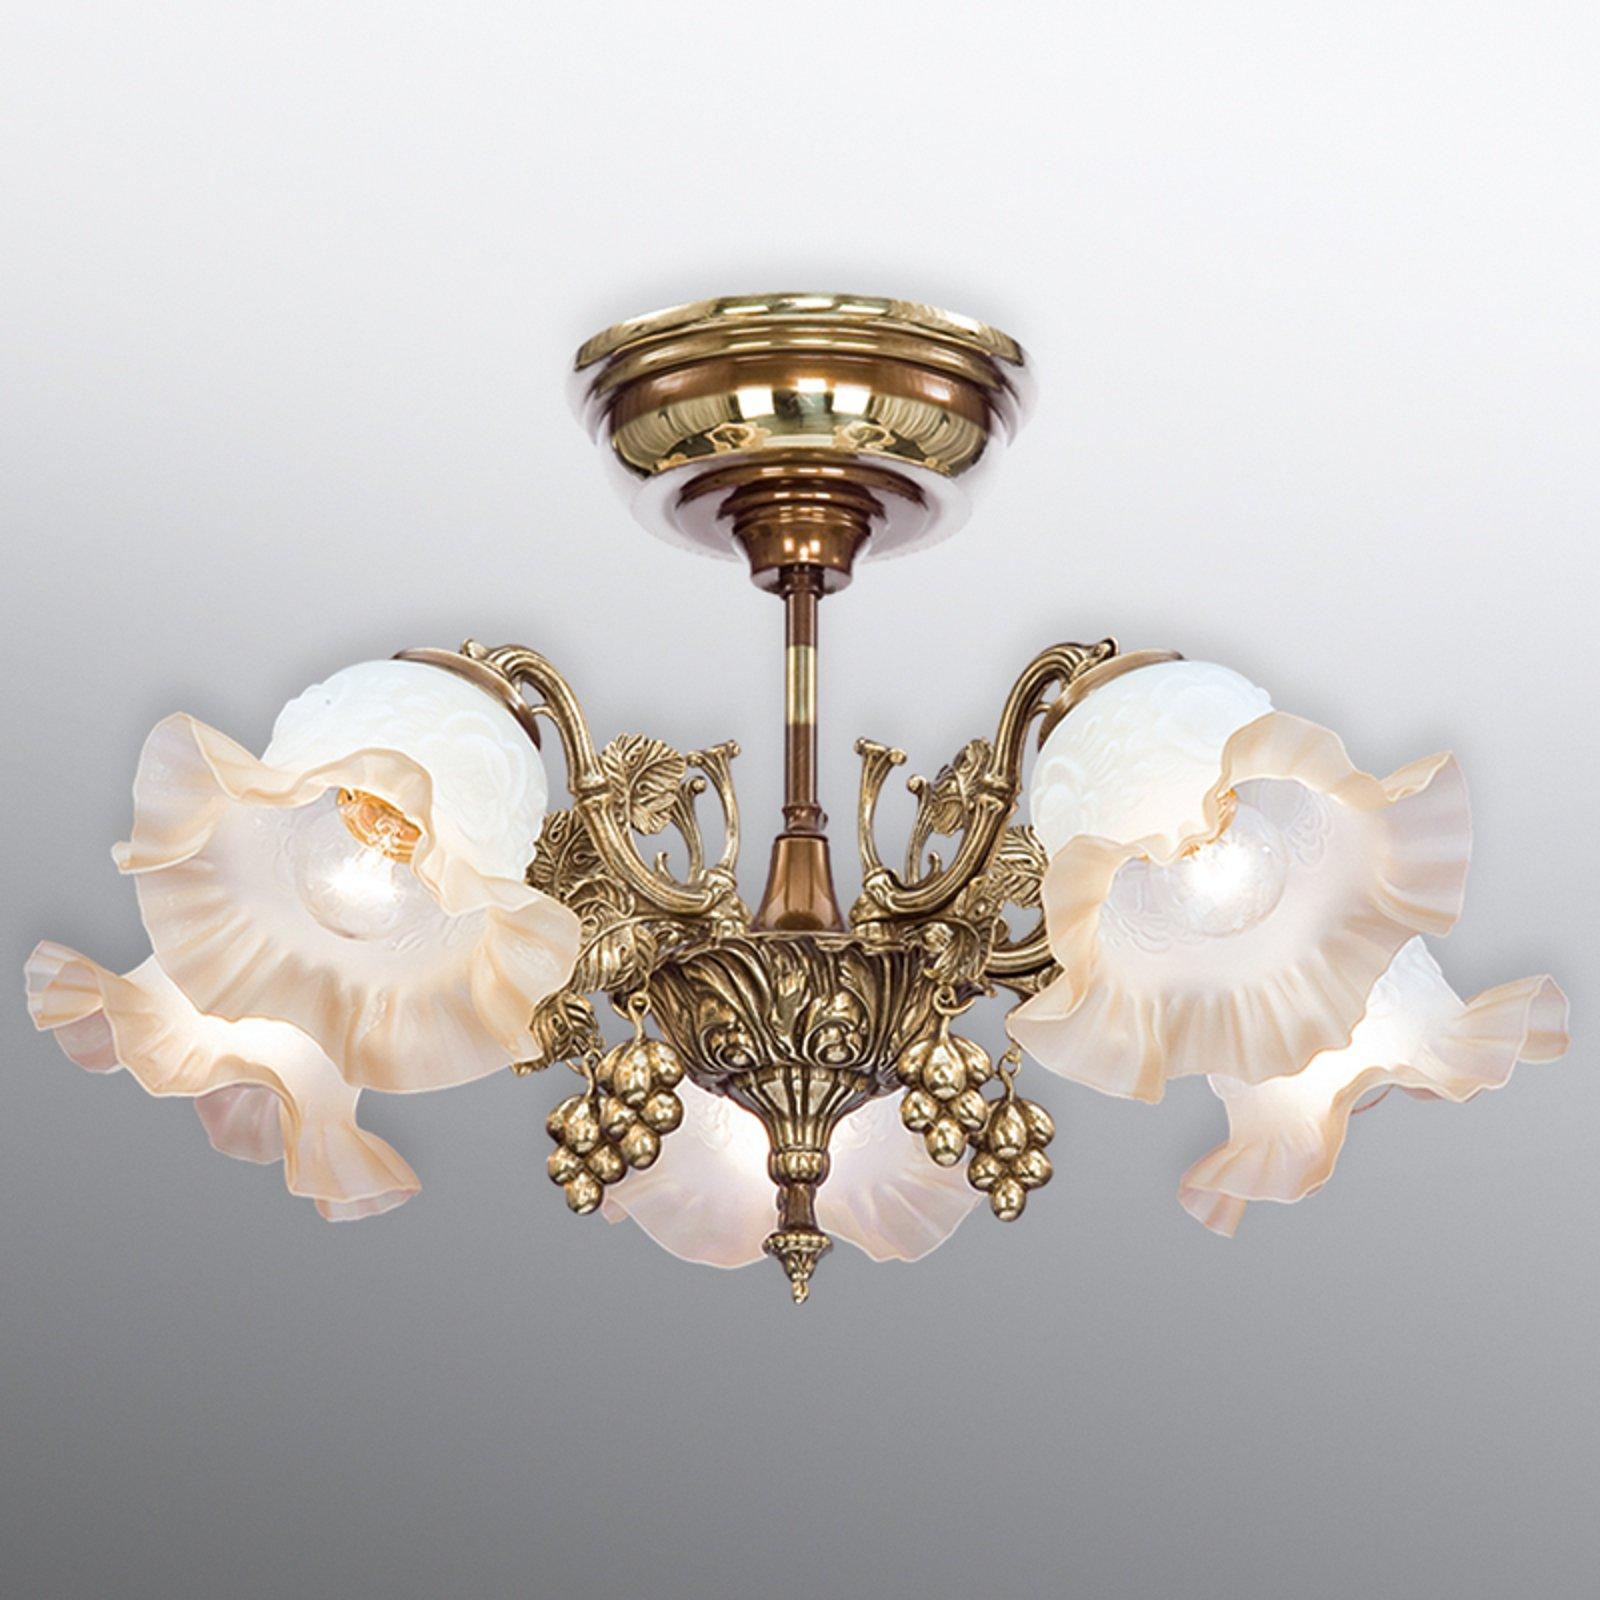 Rikelig dekorert taklampe Albero 5 lyskilder